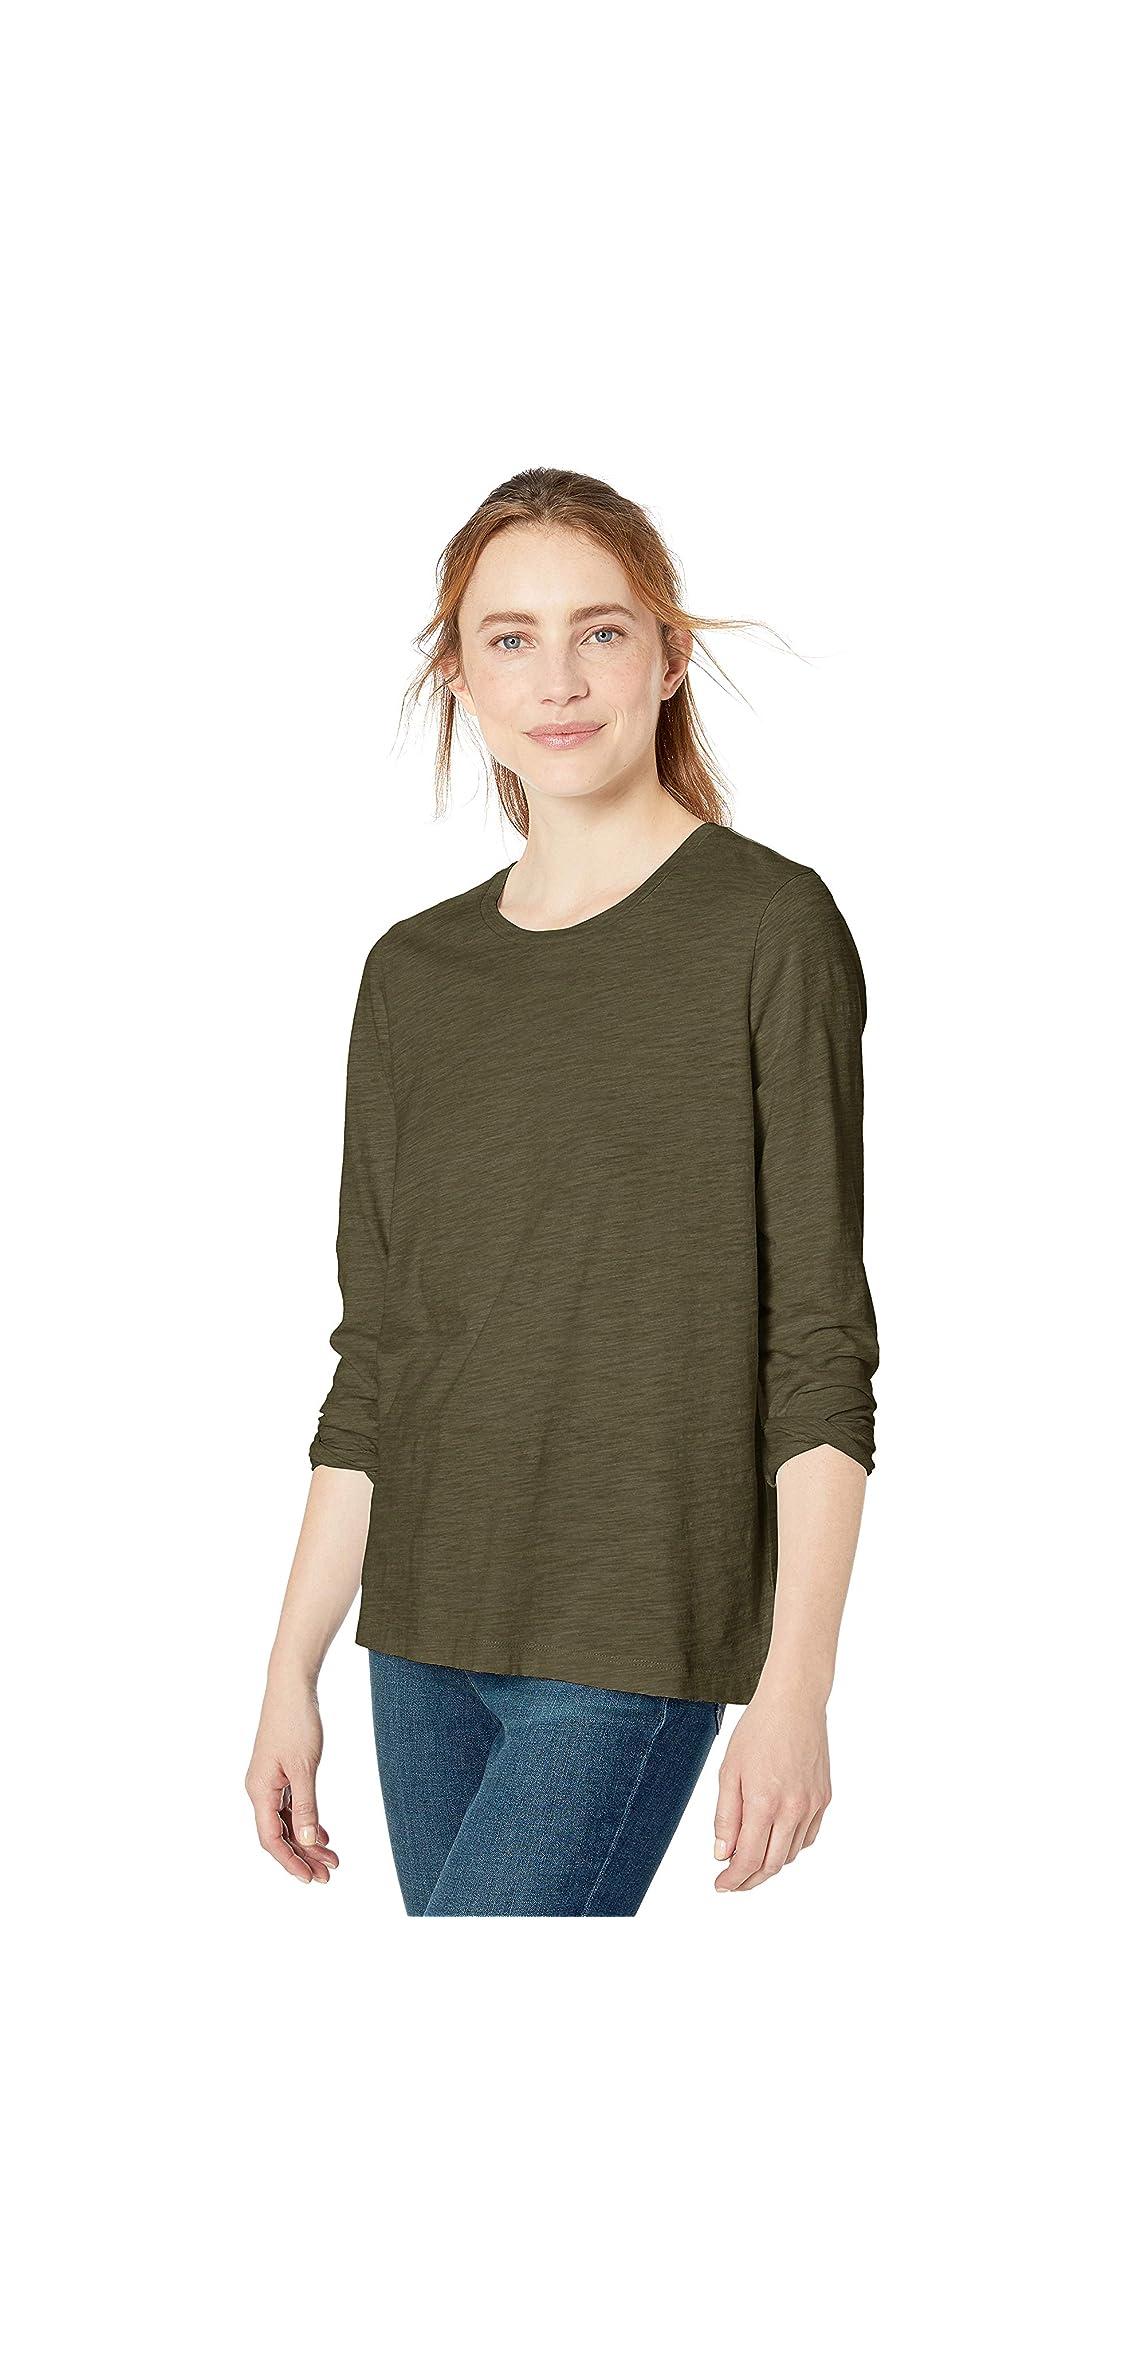 Amazon Brand - Women's Vintage Cotton Long-sleeve